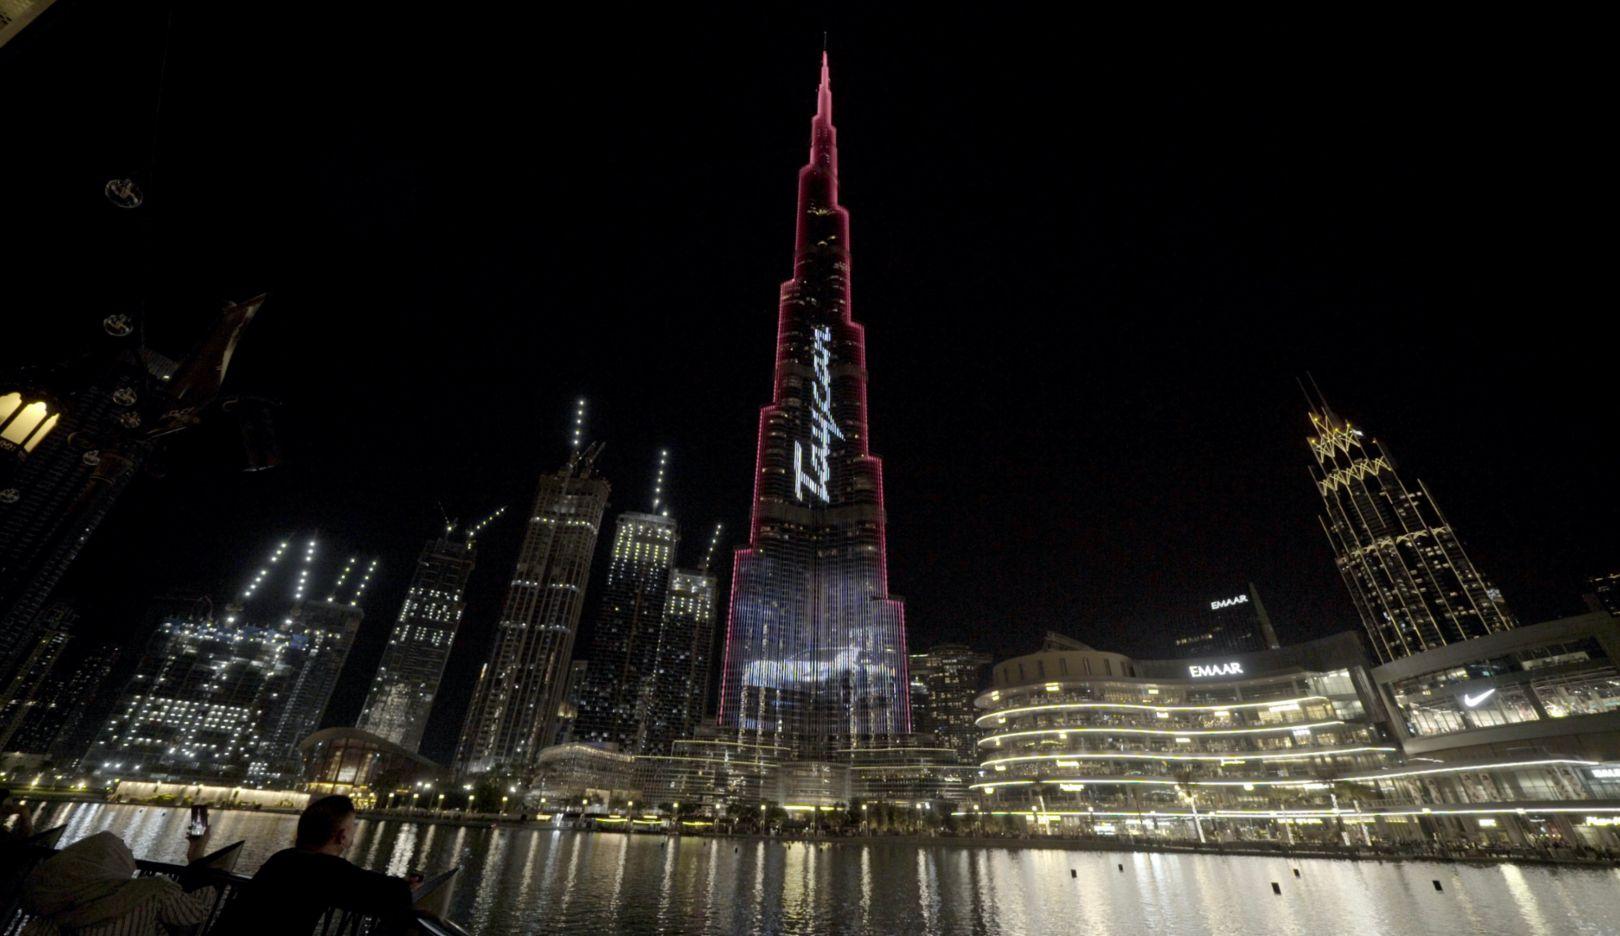 Porsche Taycan electrifies Dubai's Burj Khalifa, the world's tallest building